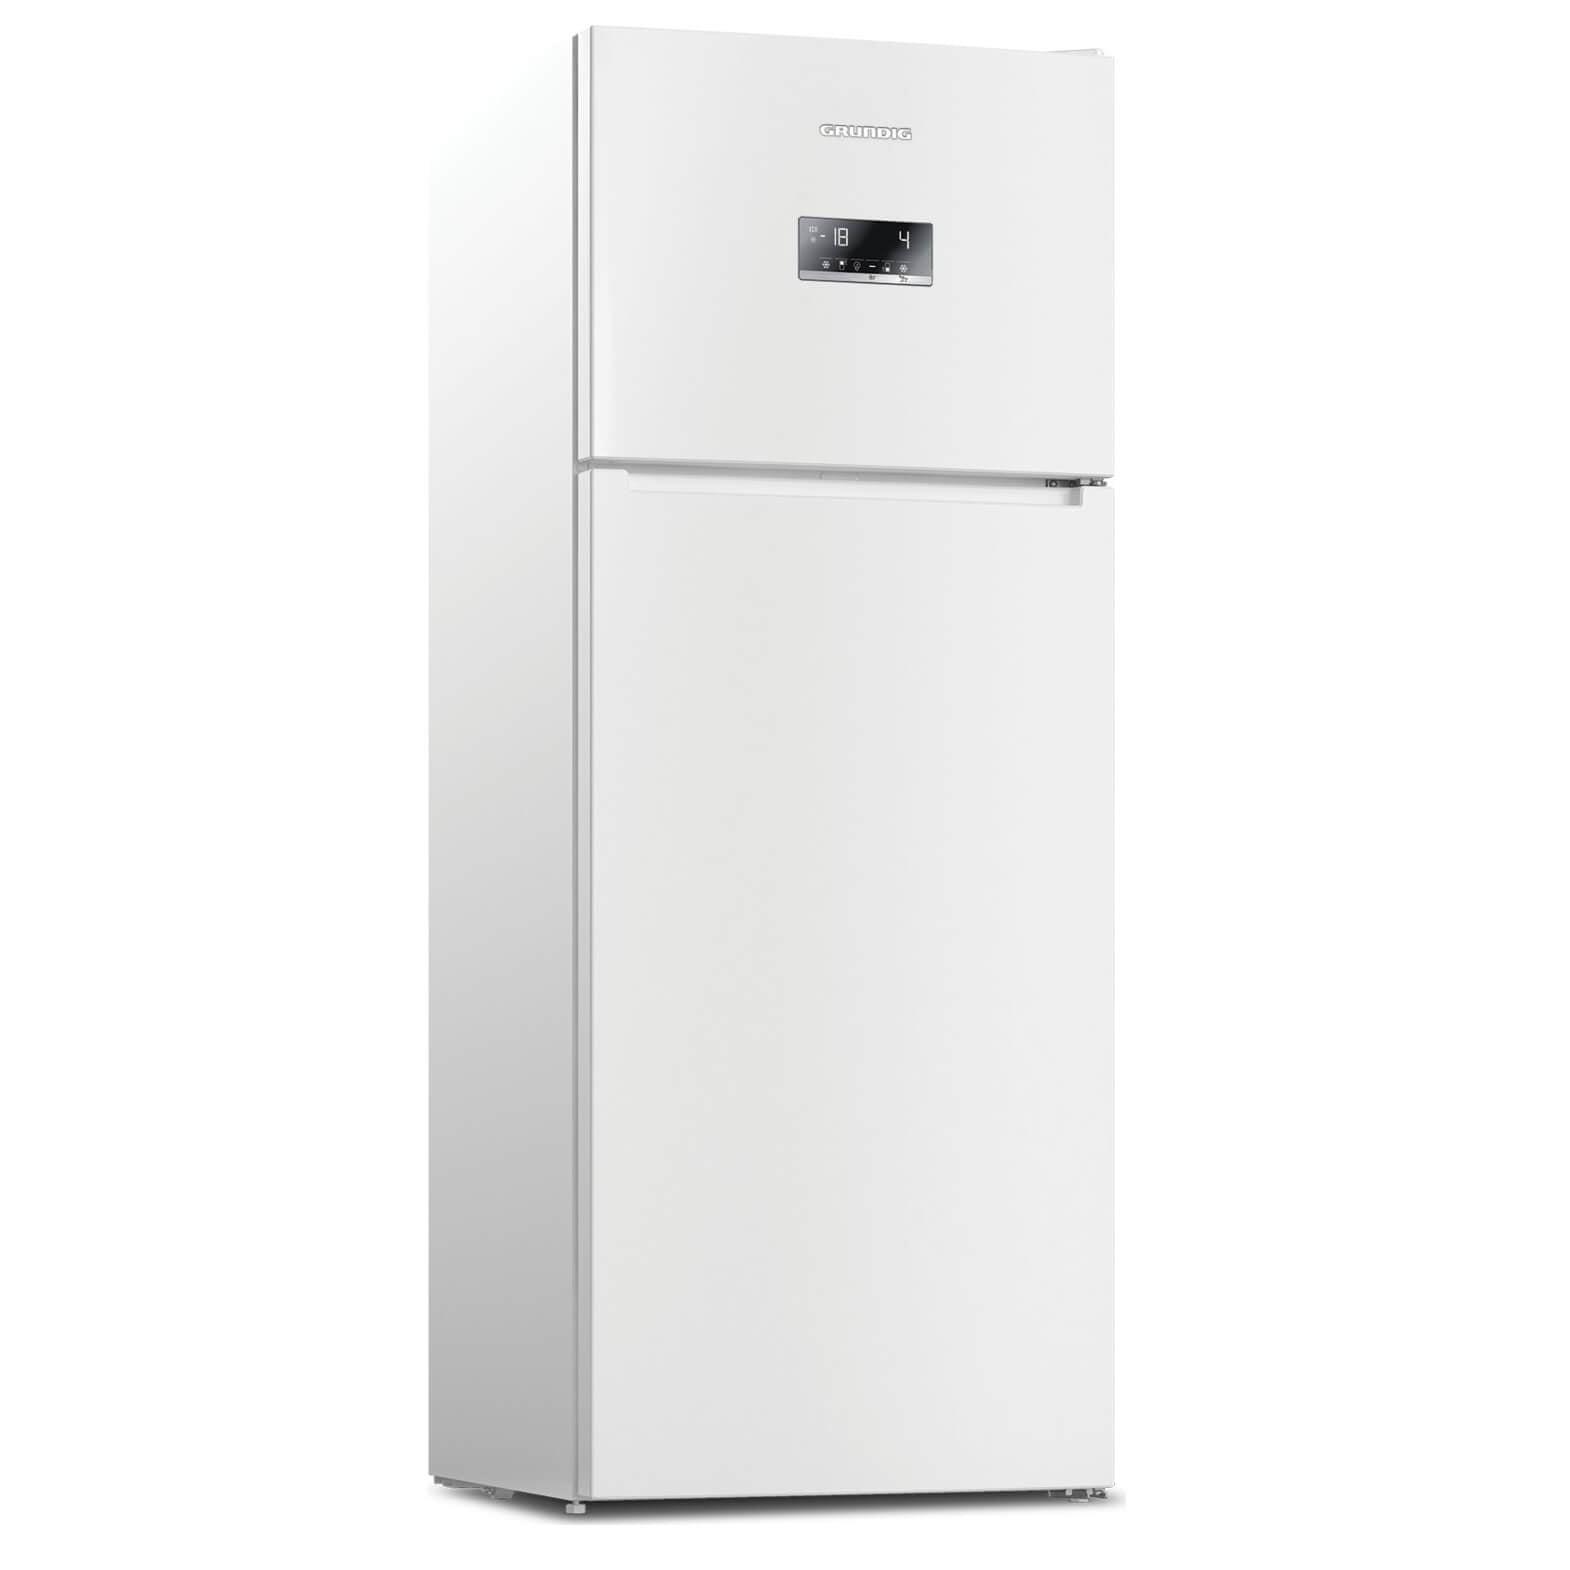 Grundig GRND 5110 buzdolabi